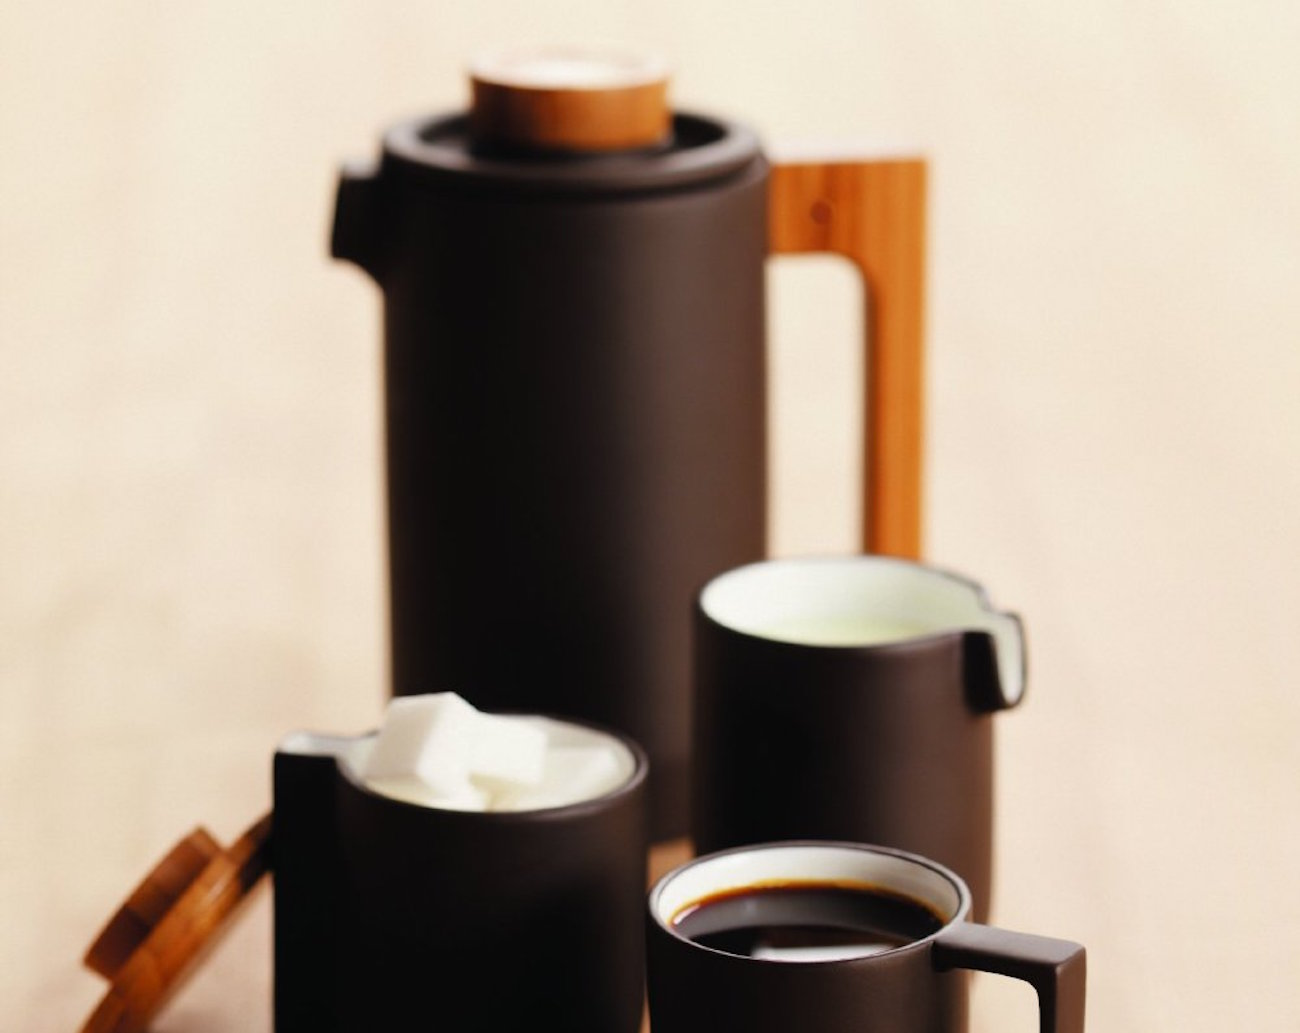 Purple Clay Coffee Set by JIA Inc